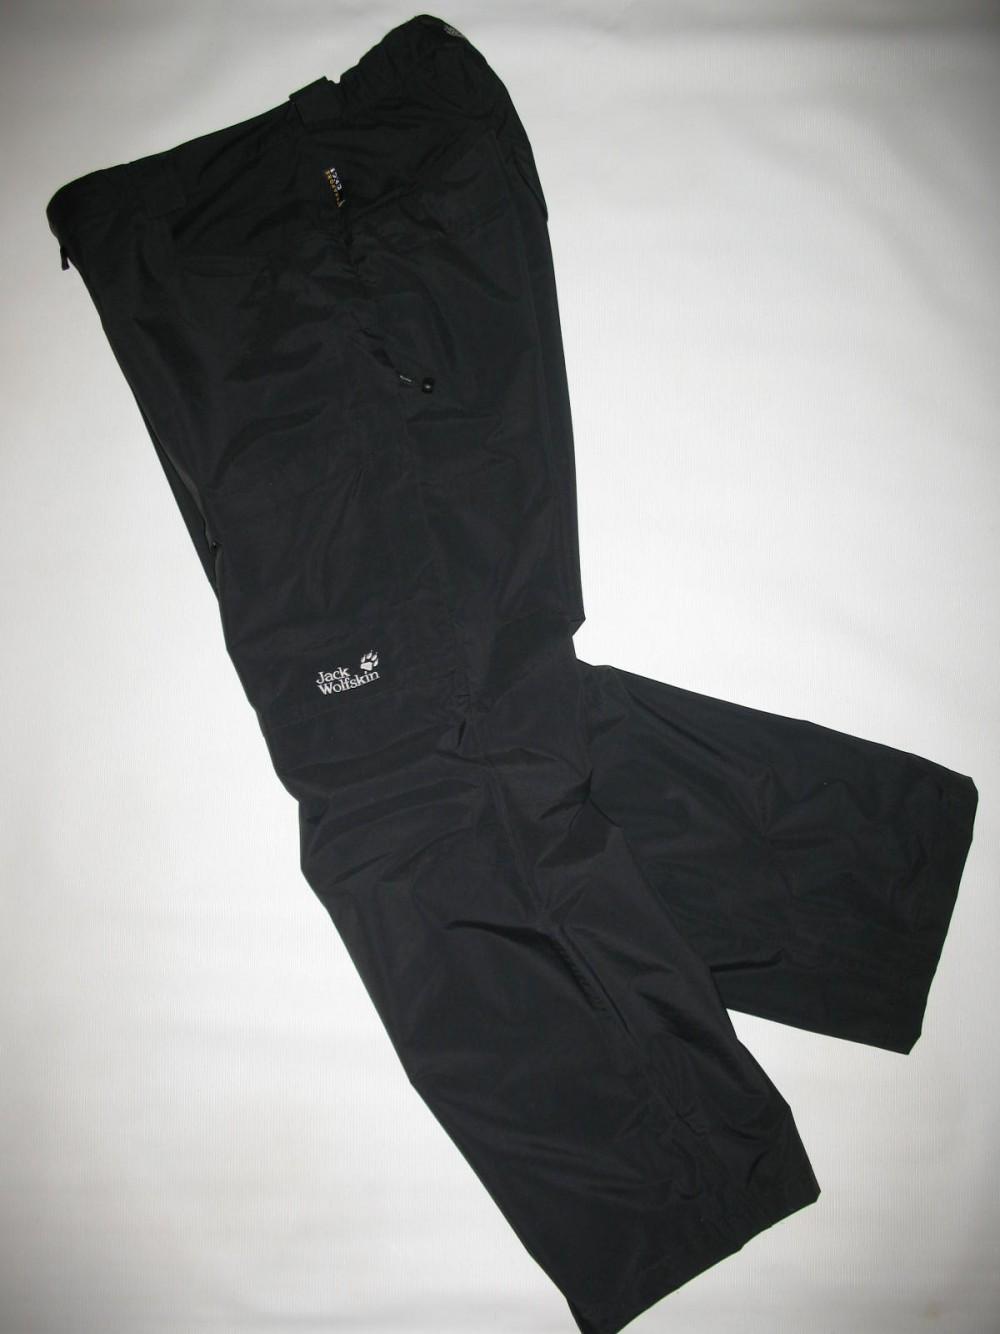 Штаны JACK WOLFSKIN texapore pants (размер M) - 3